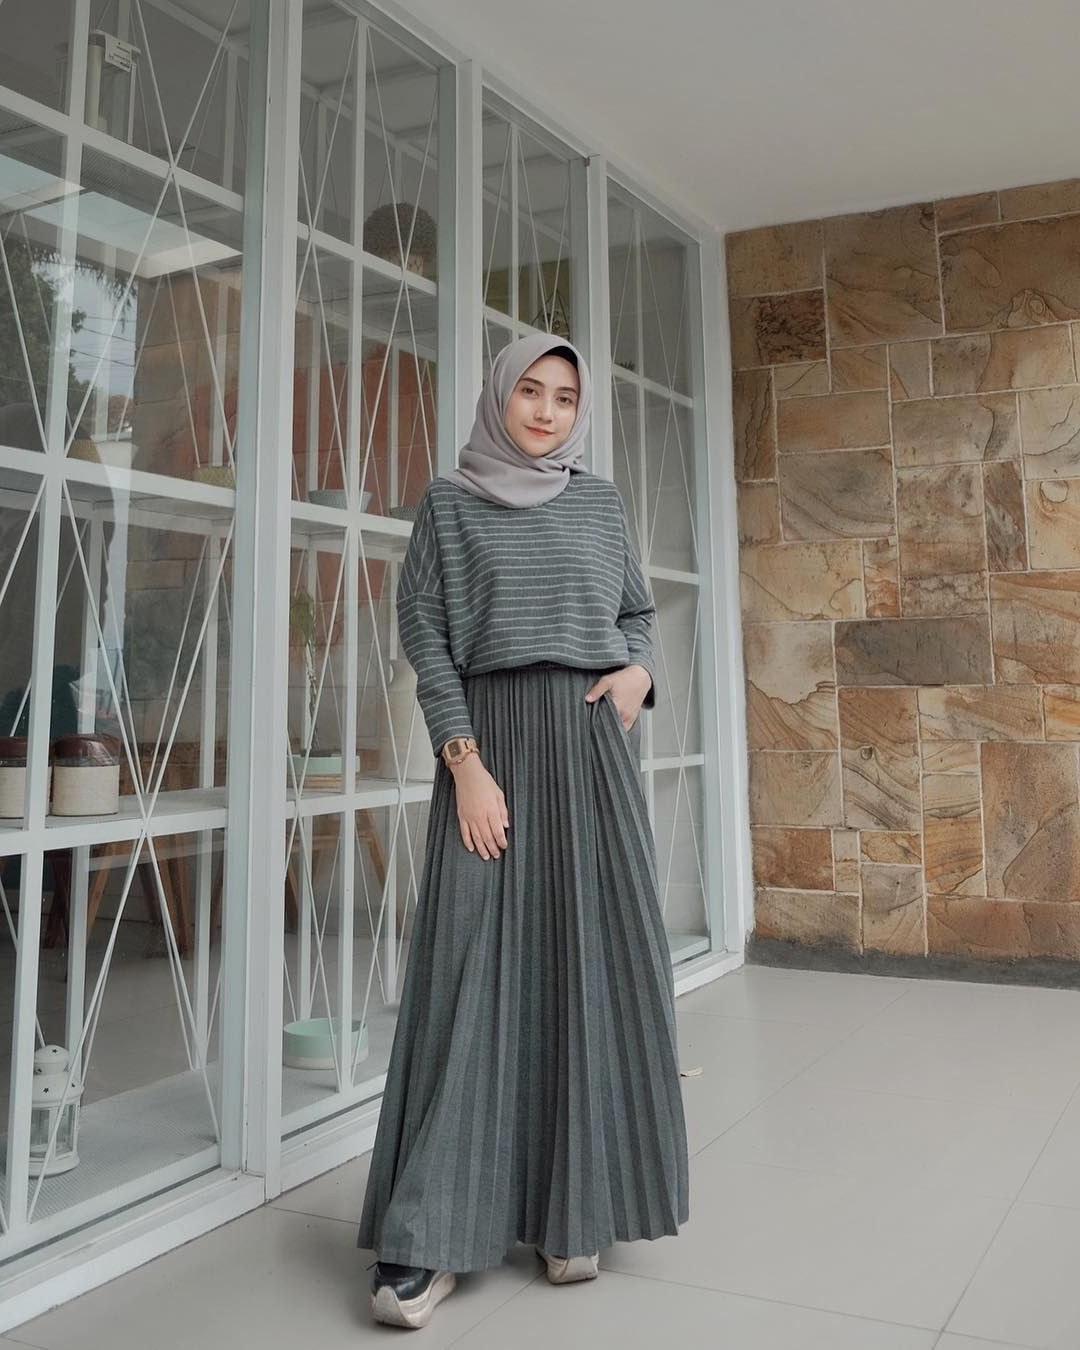 Model Model Baju Lebaran Keluarga Terbaru 2019 Y7du Baju Muslim Lebaran Terbaru 2019 Dengan Gambar